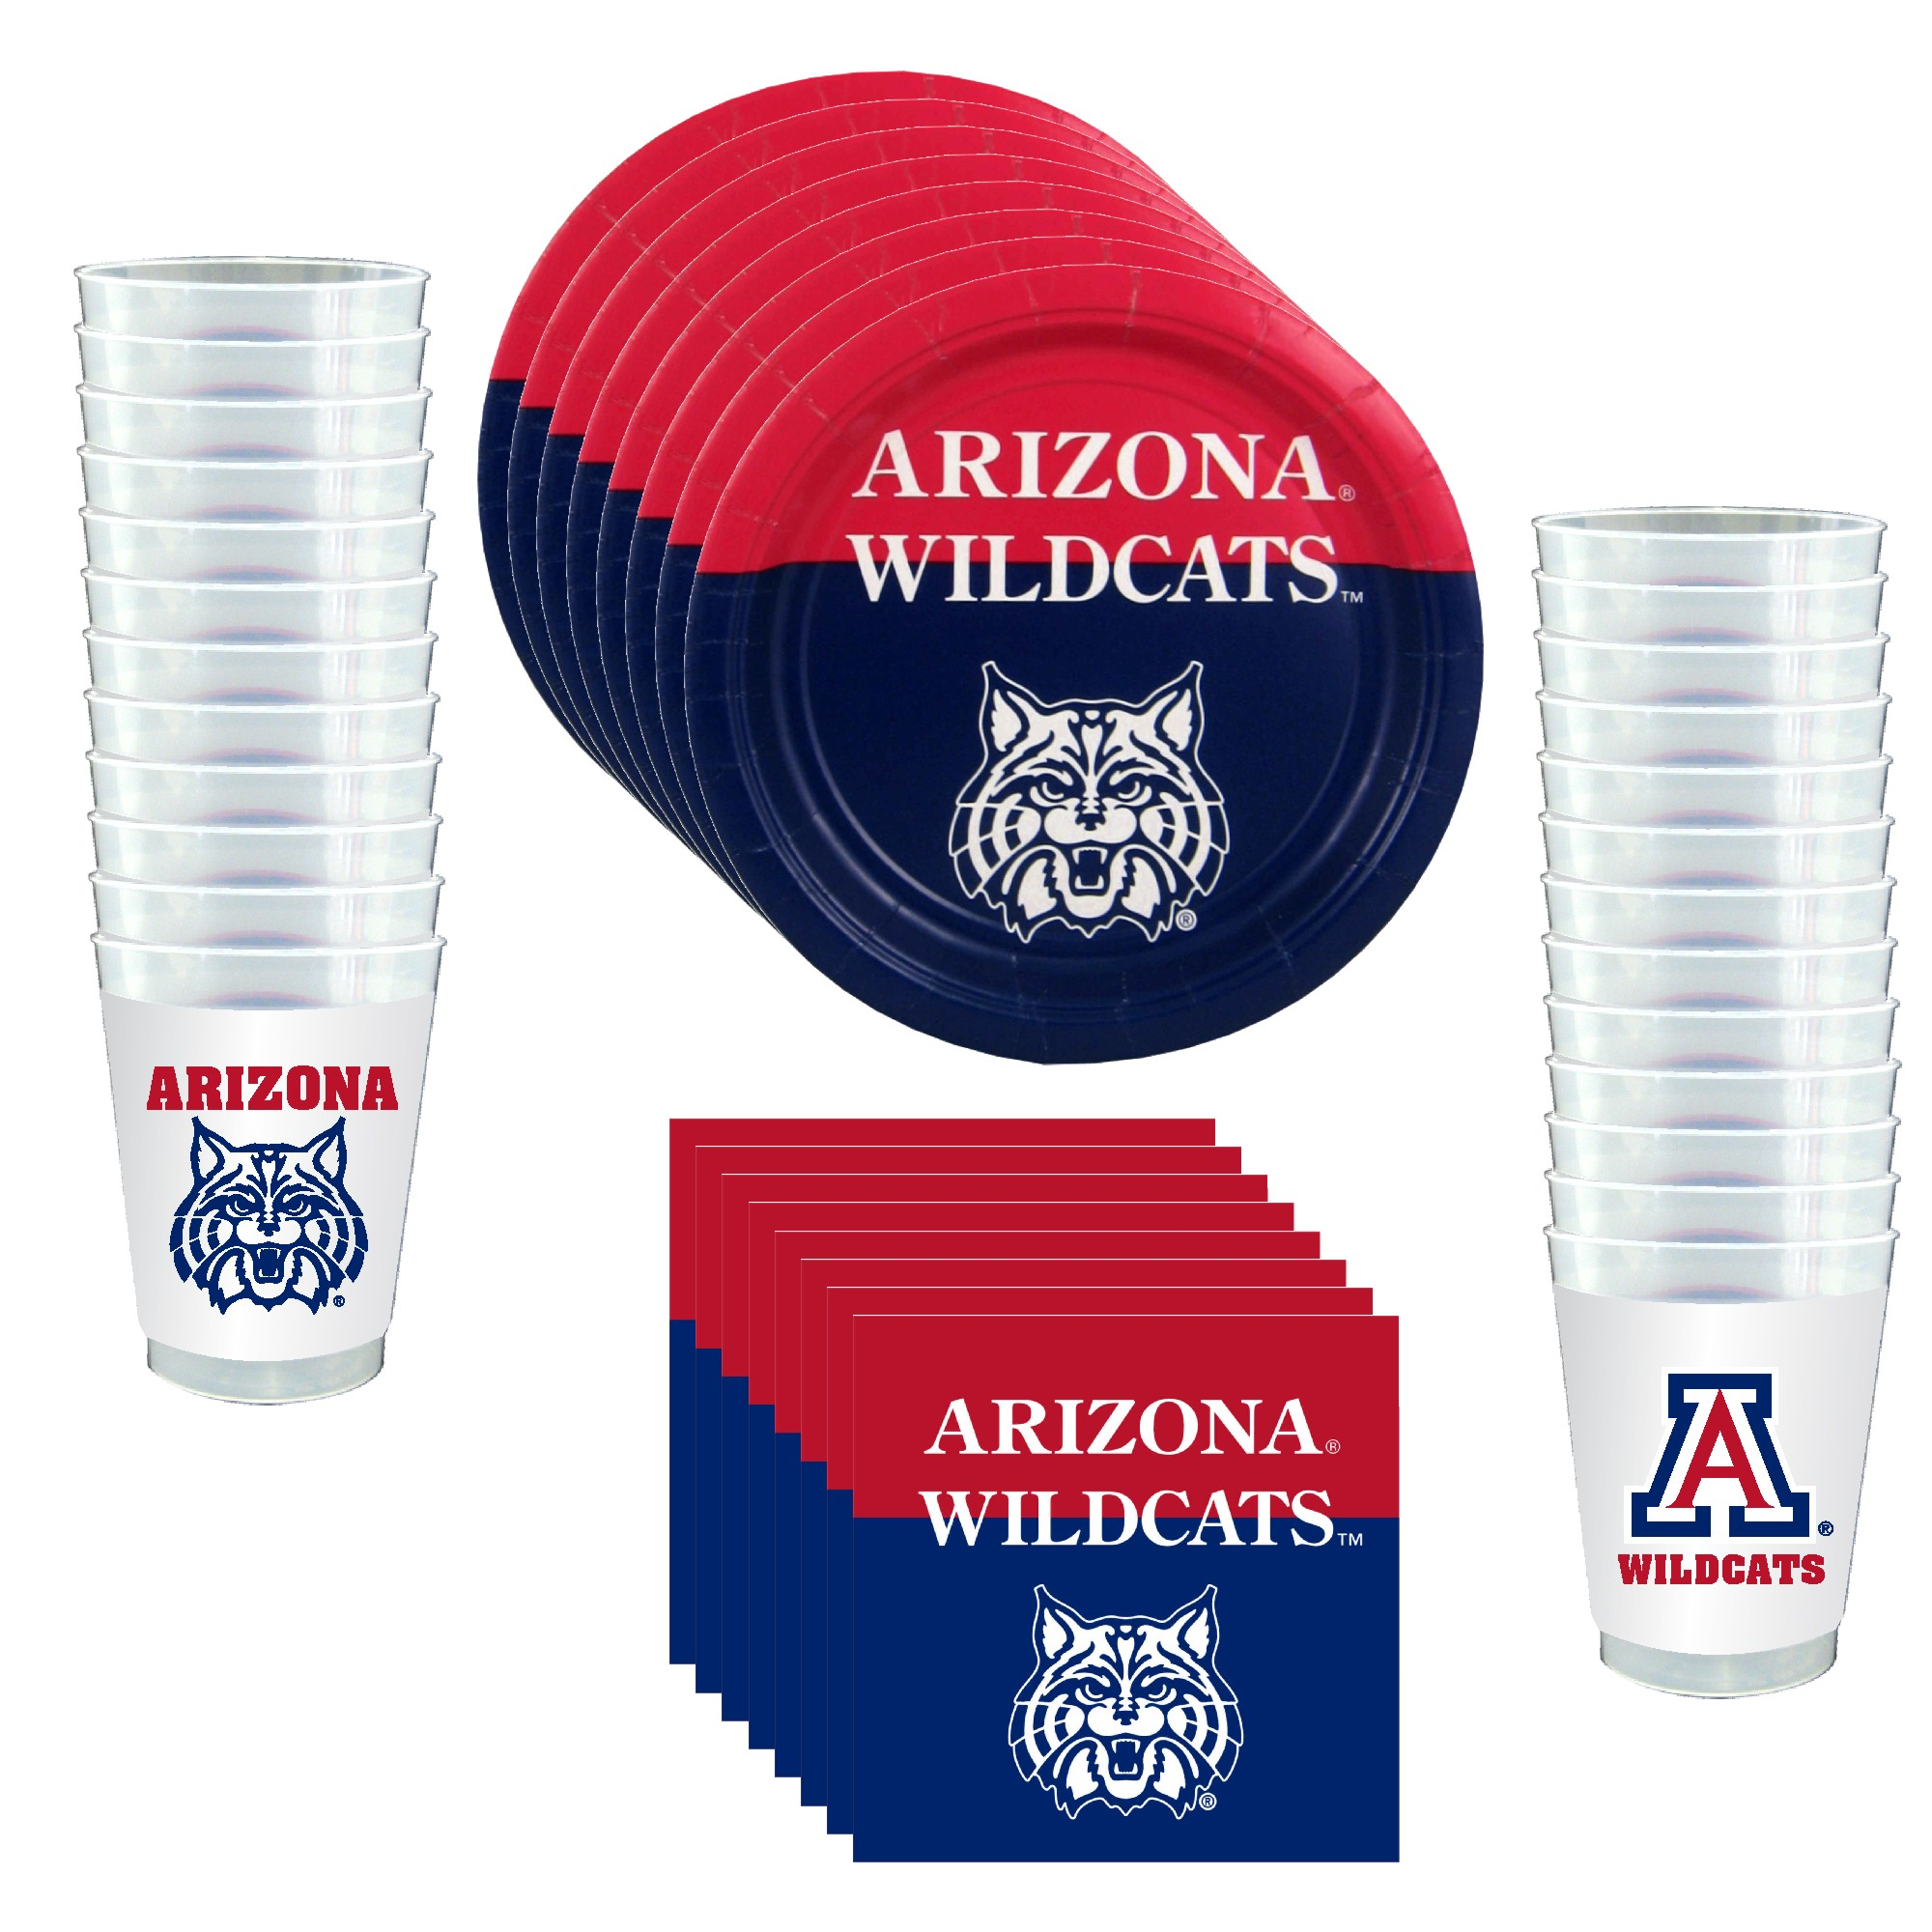 Arizona Wildcats Party Supplies - 81 Pieces (Serves 24)